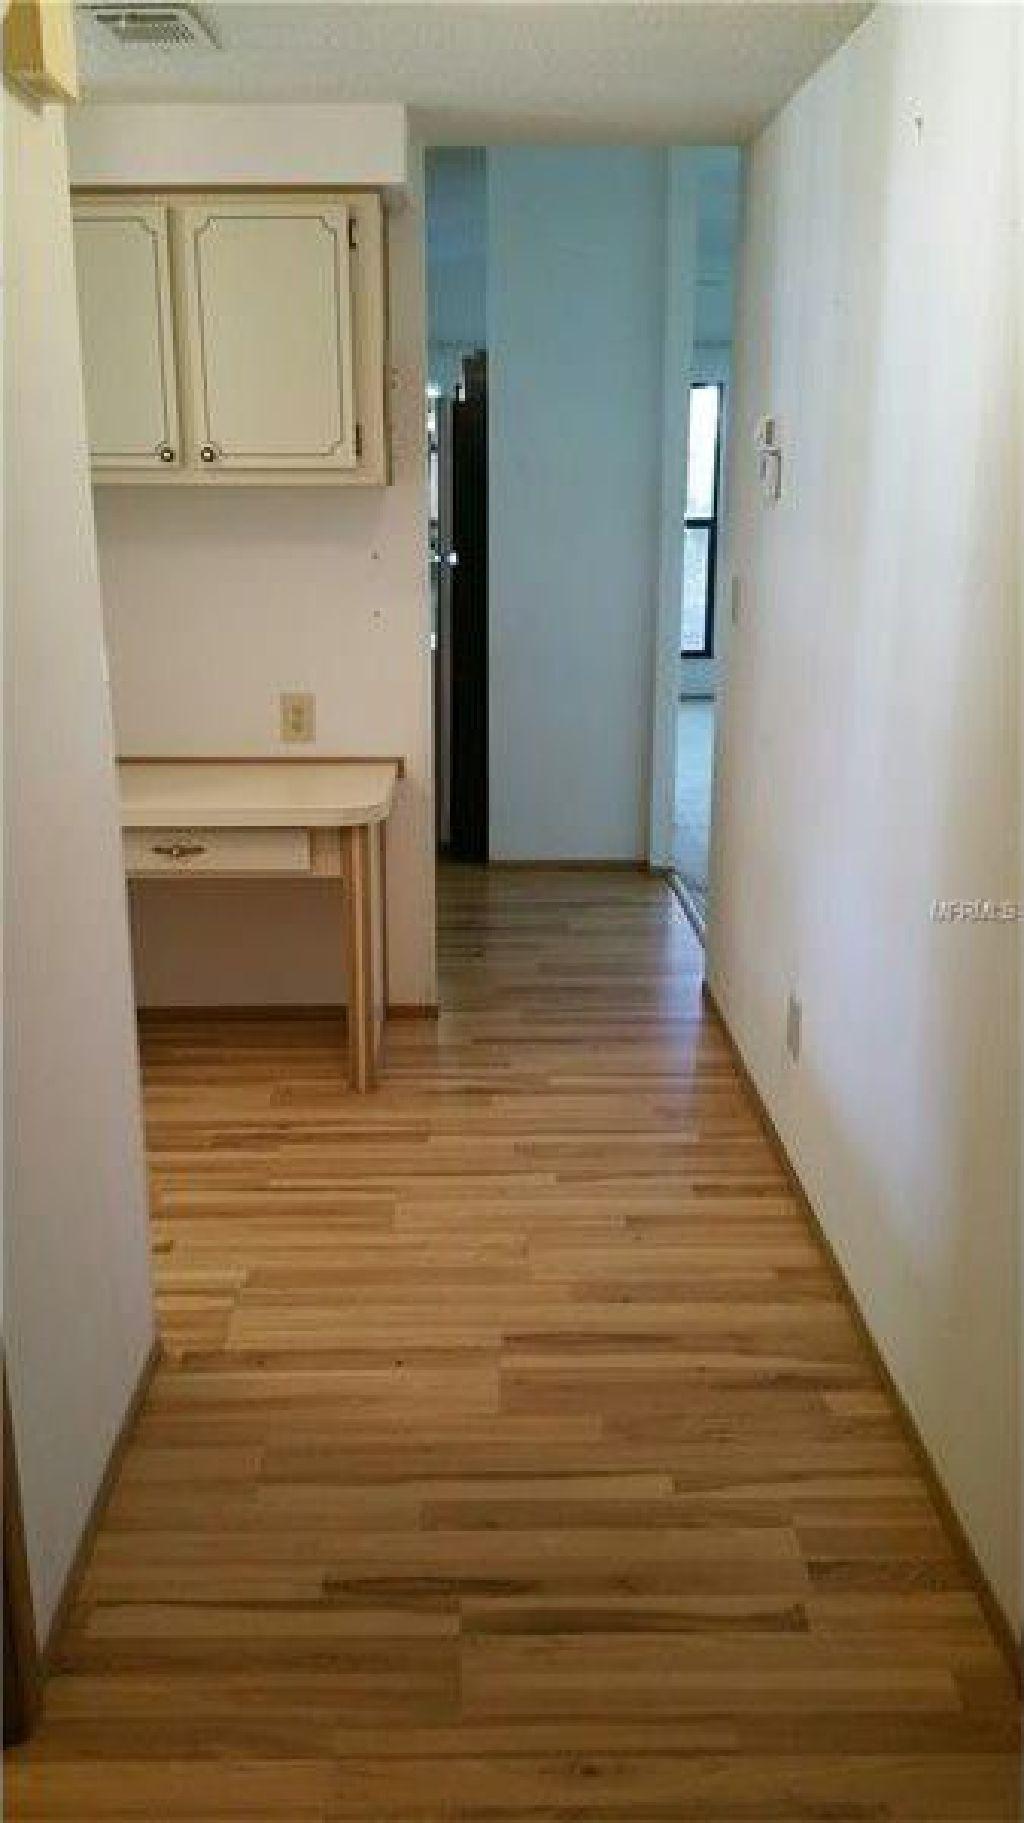 No HOA! Stylish 2 bedroom 2 bathroom home